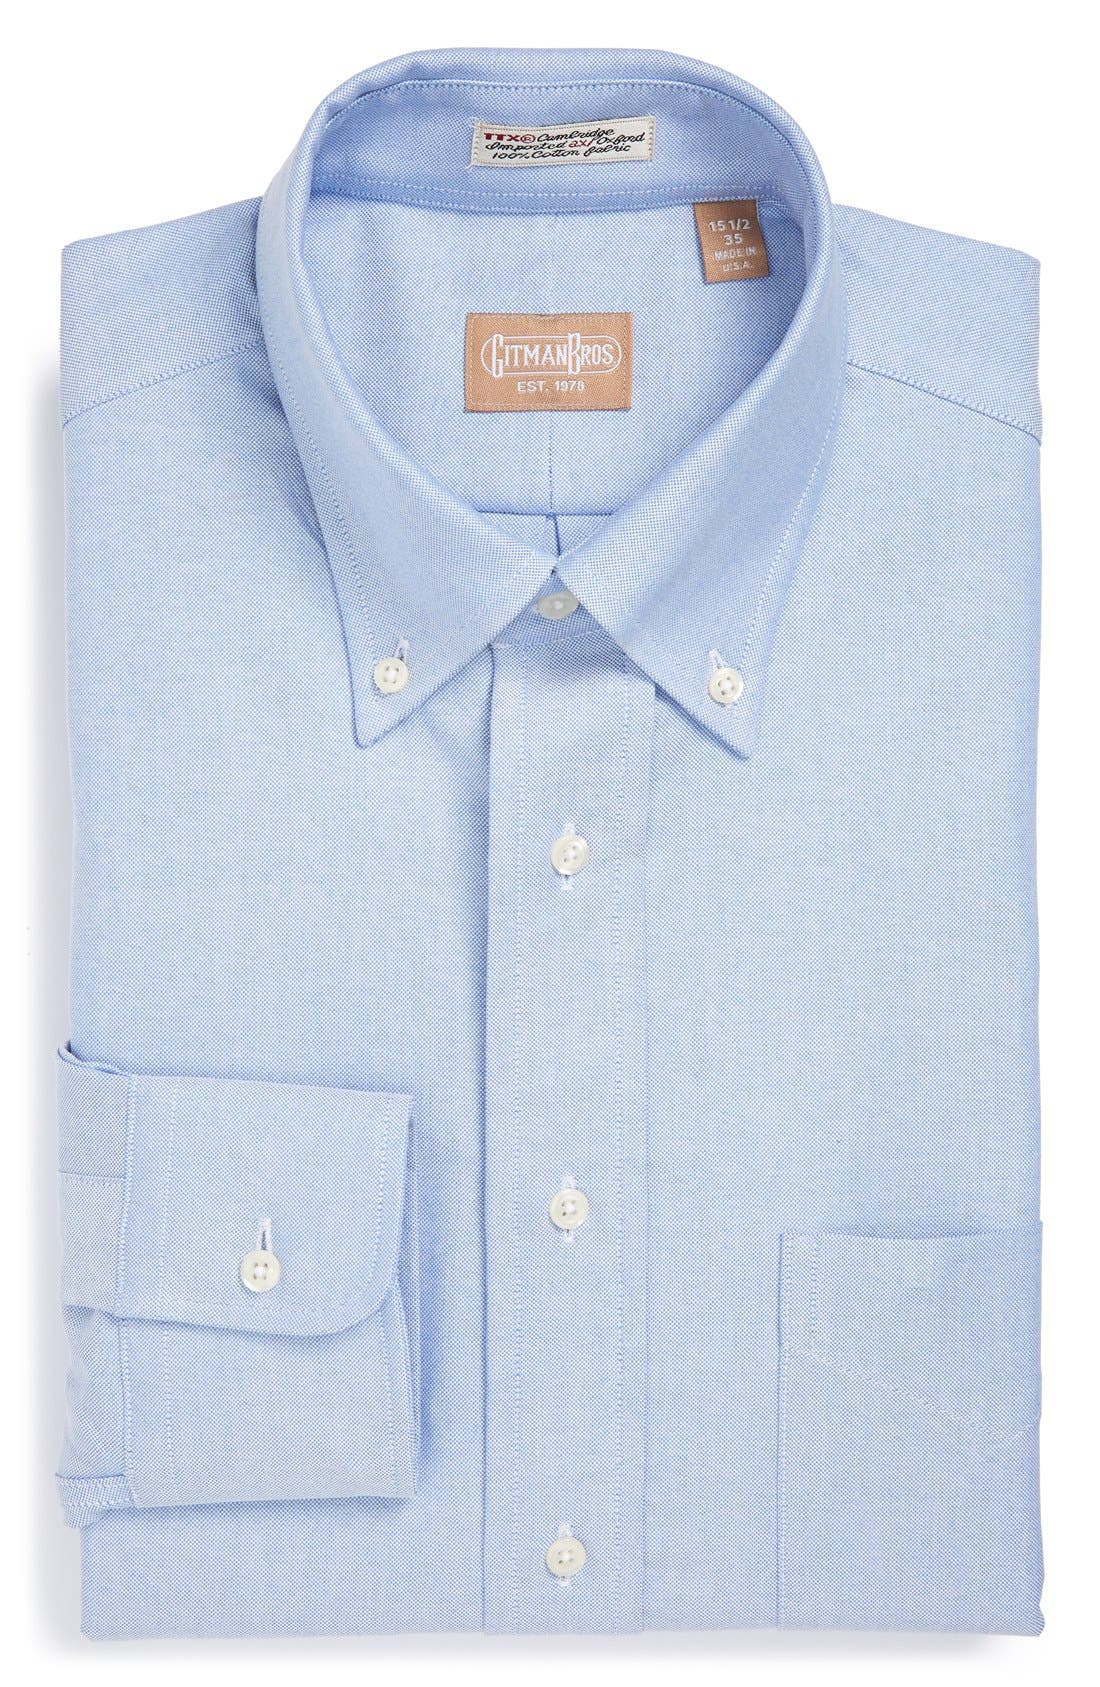 Main Image - Gitman 'Cambridge Oxford' Regular Fit Dress Shirt